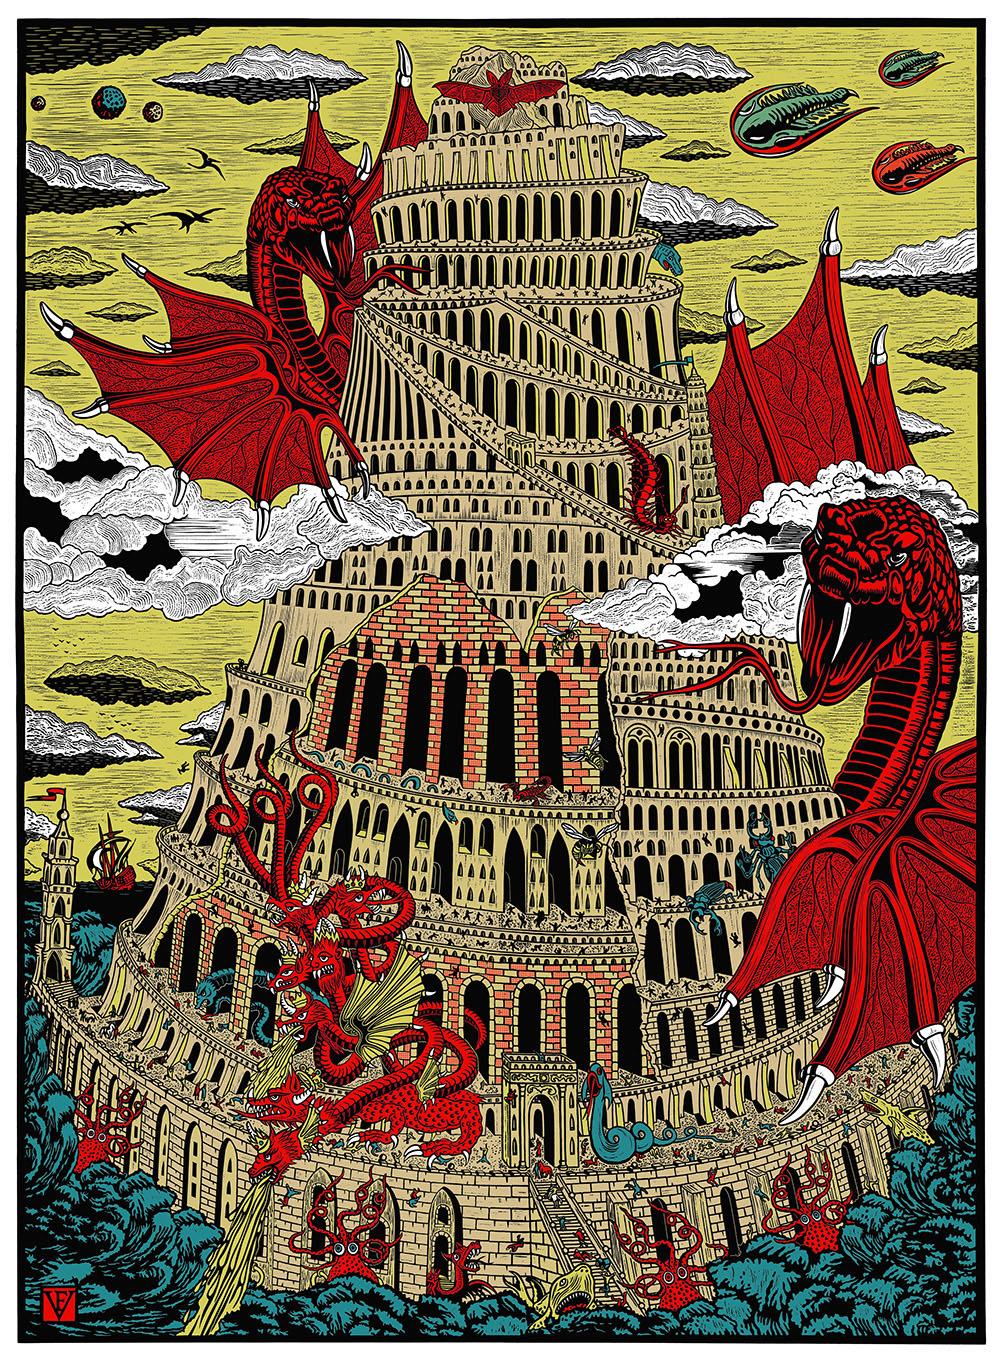 02_chimera_frederic voisin_Tour de Babel